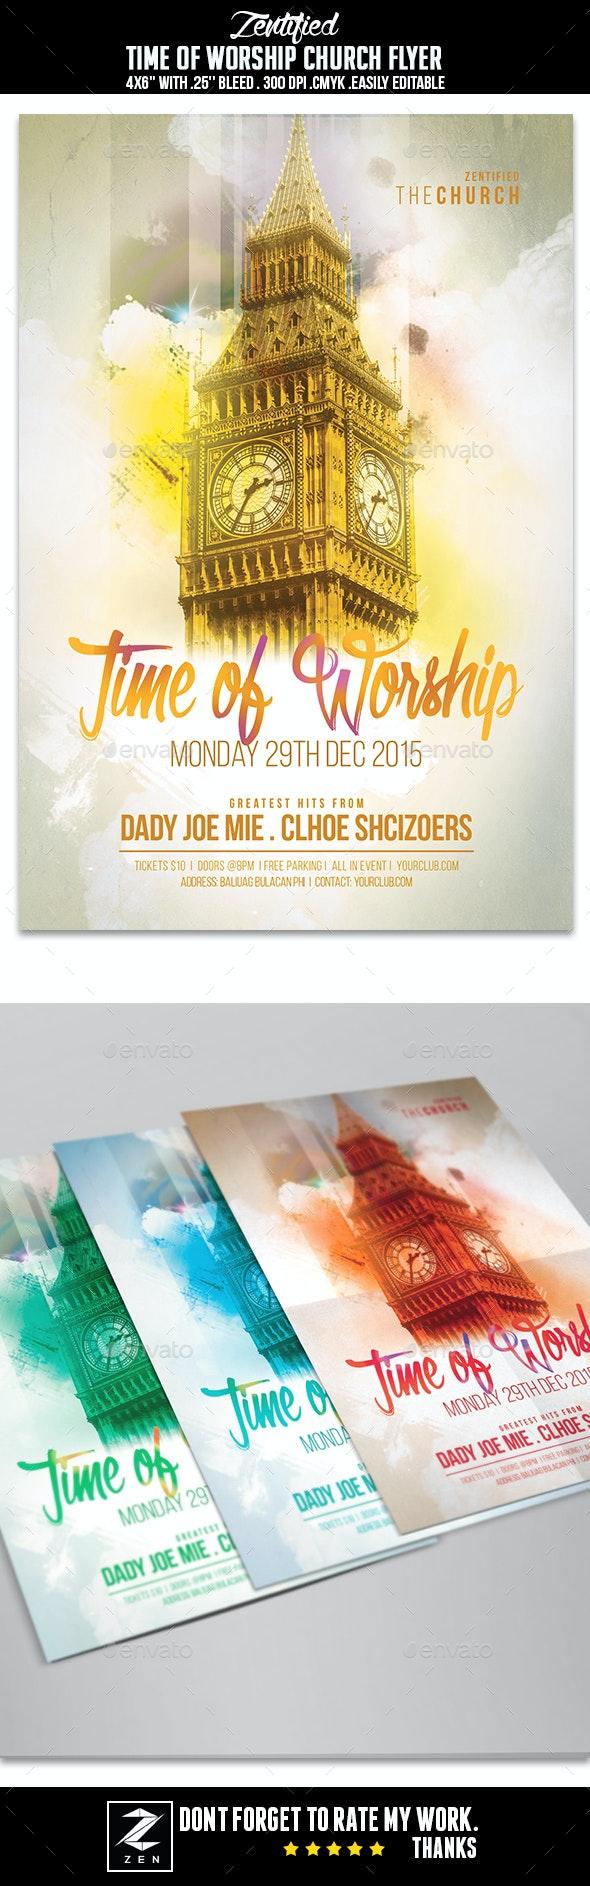 Time Of Worship Church Flyer - Church Flyers